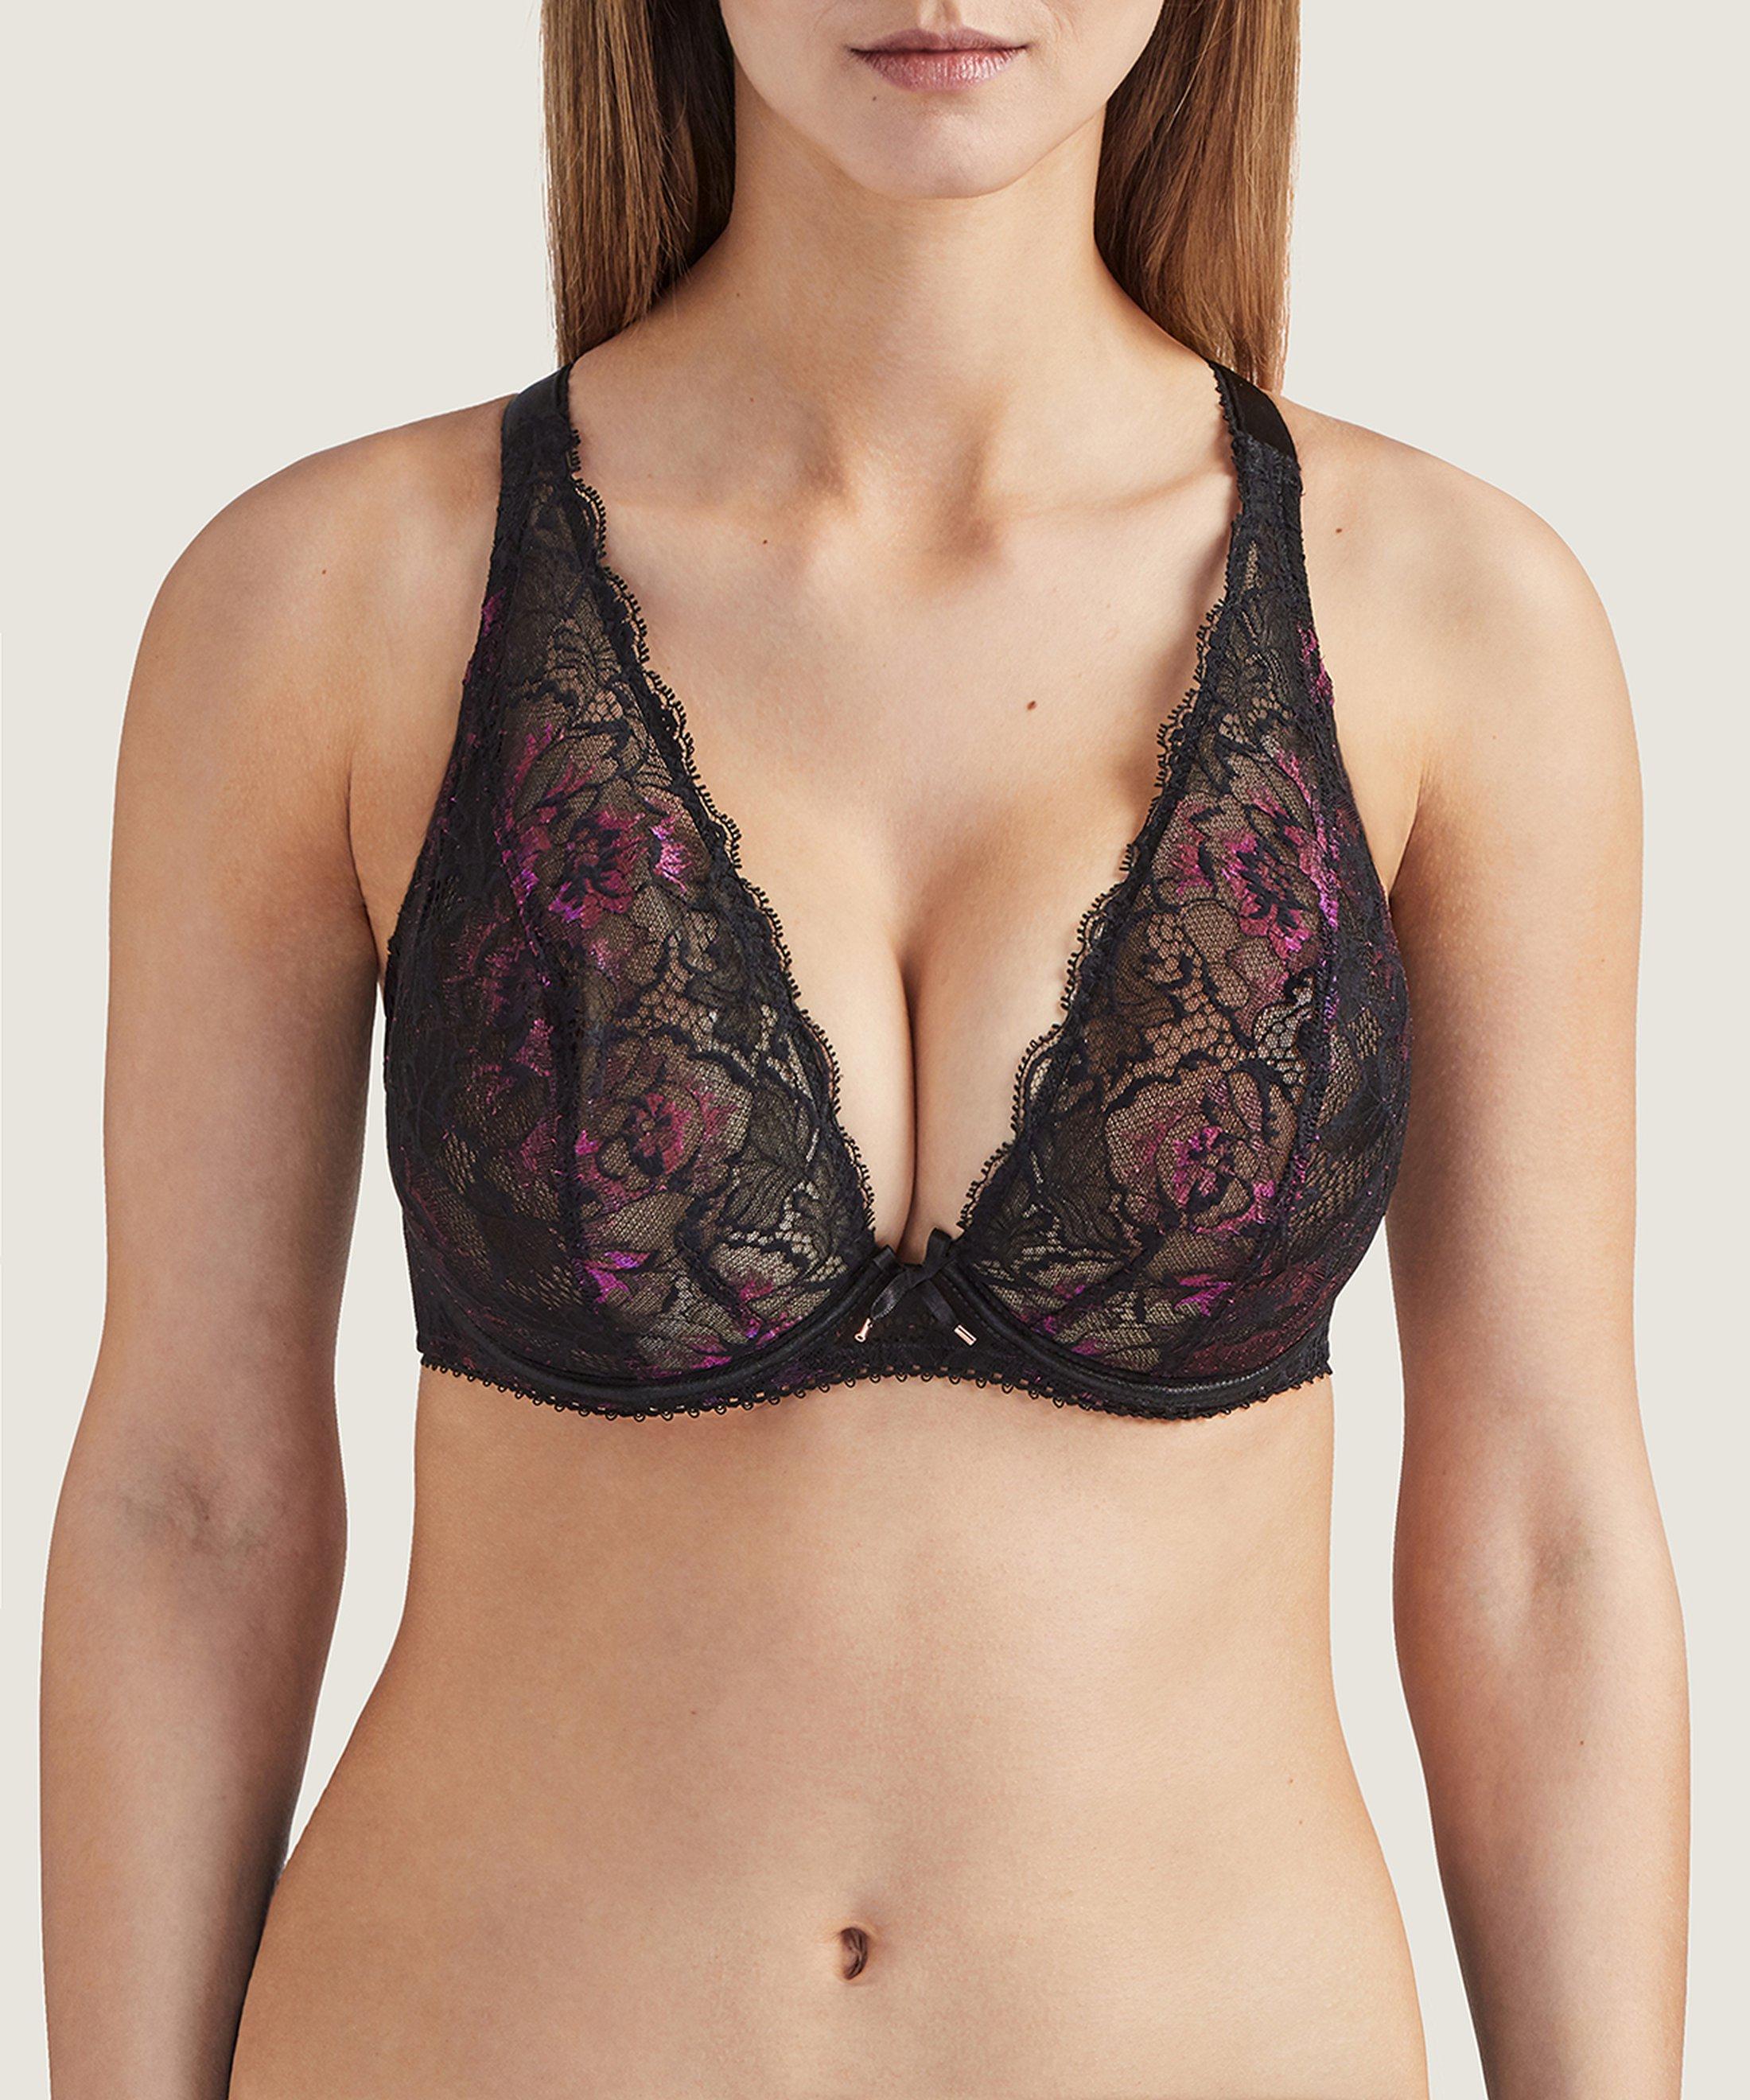 AUBE AMOUREUSE Soutien-gorge triangle avec armatures confort Violetta | Aubade